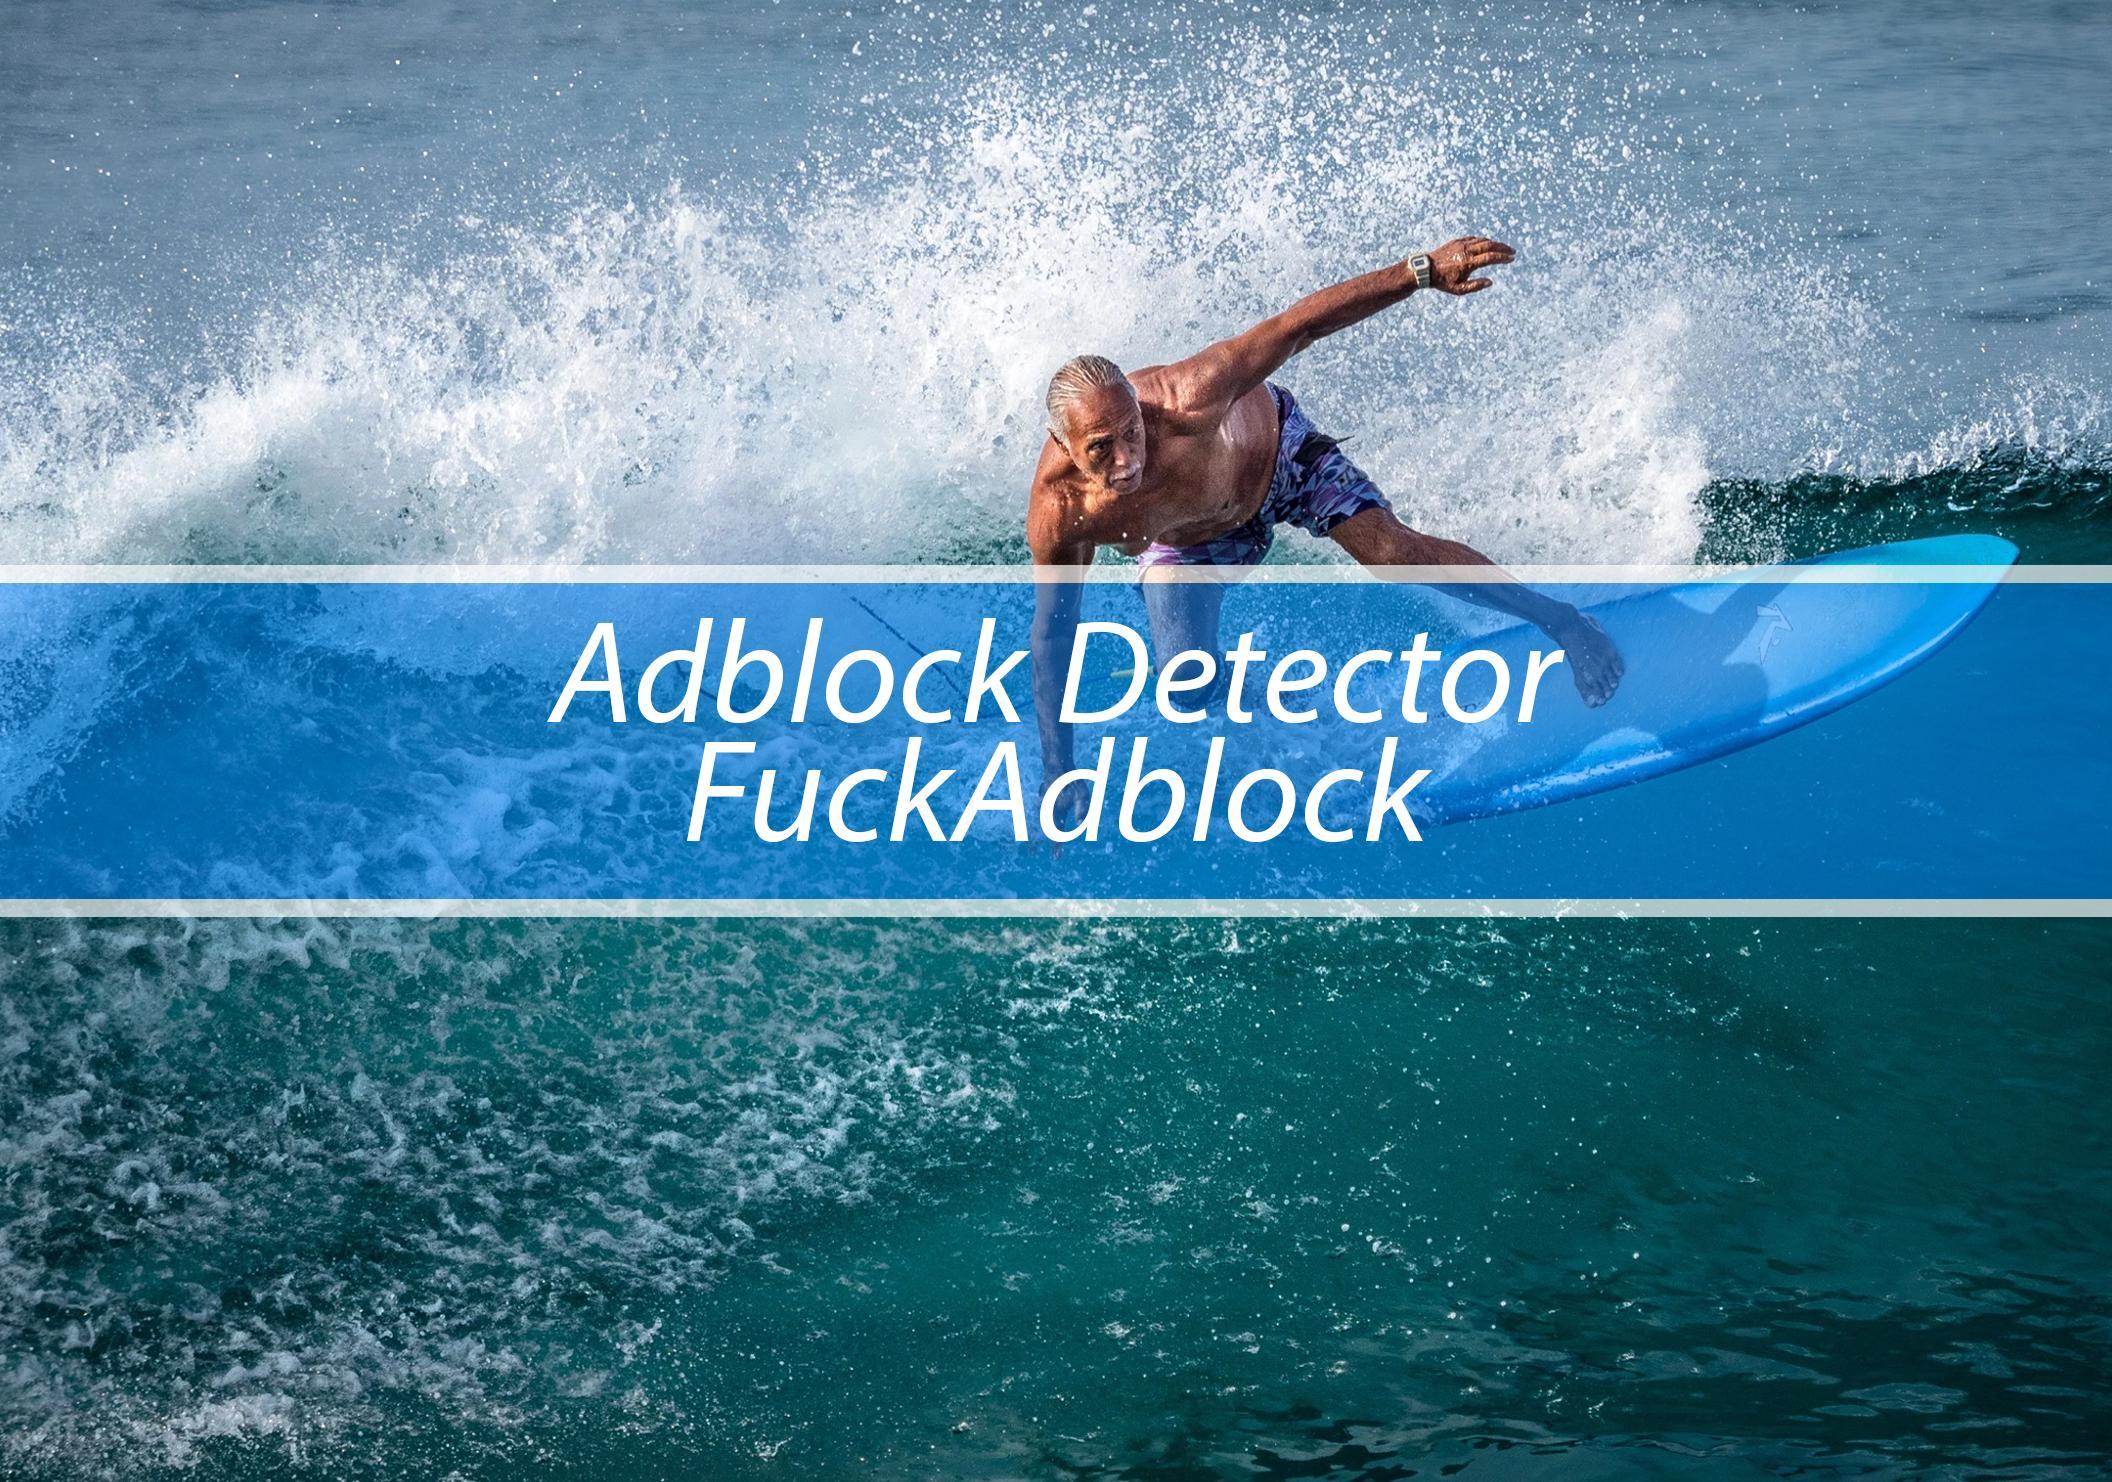 AdBlock Detector FuckAdBlock (BlockAdBlock)